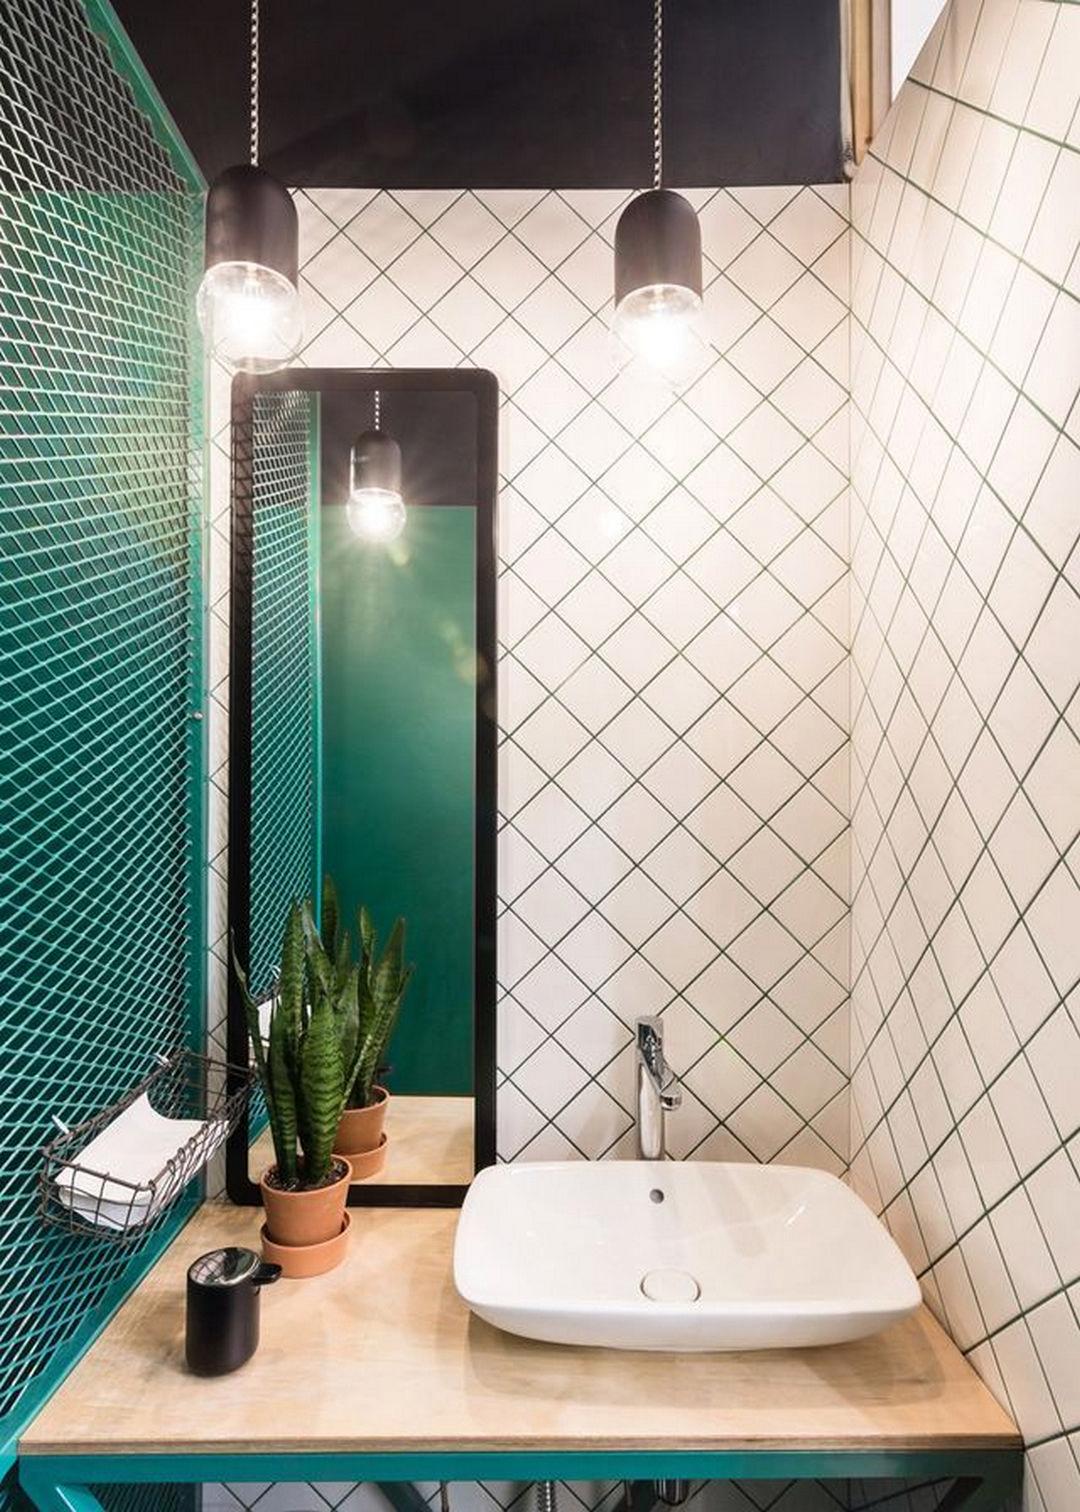 How To Create Safe And Modern Bathroom Design Diseno De Banos